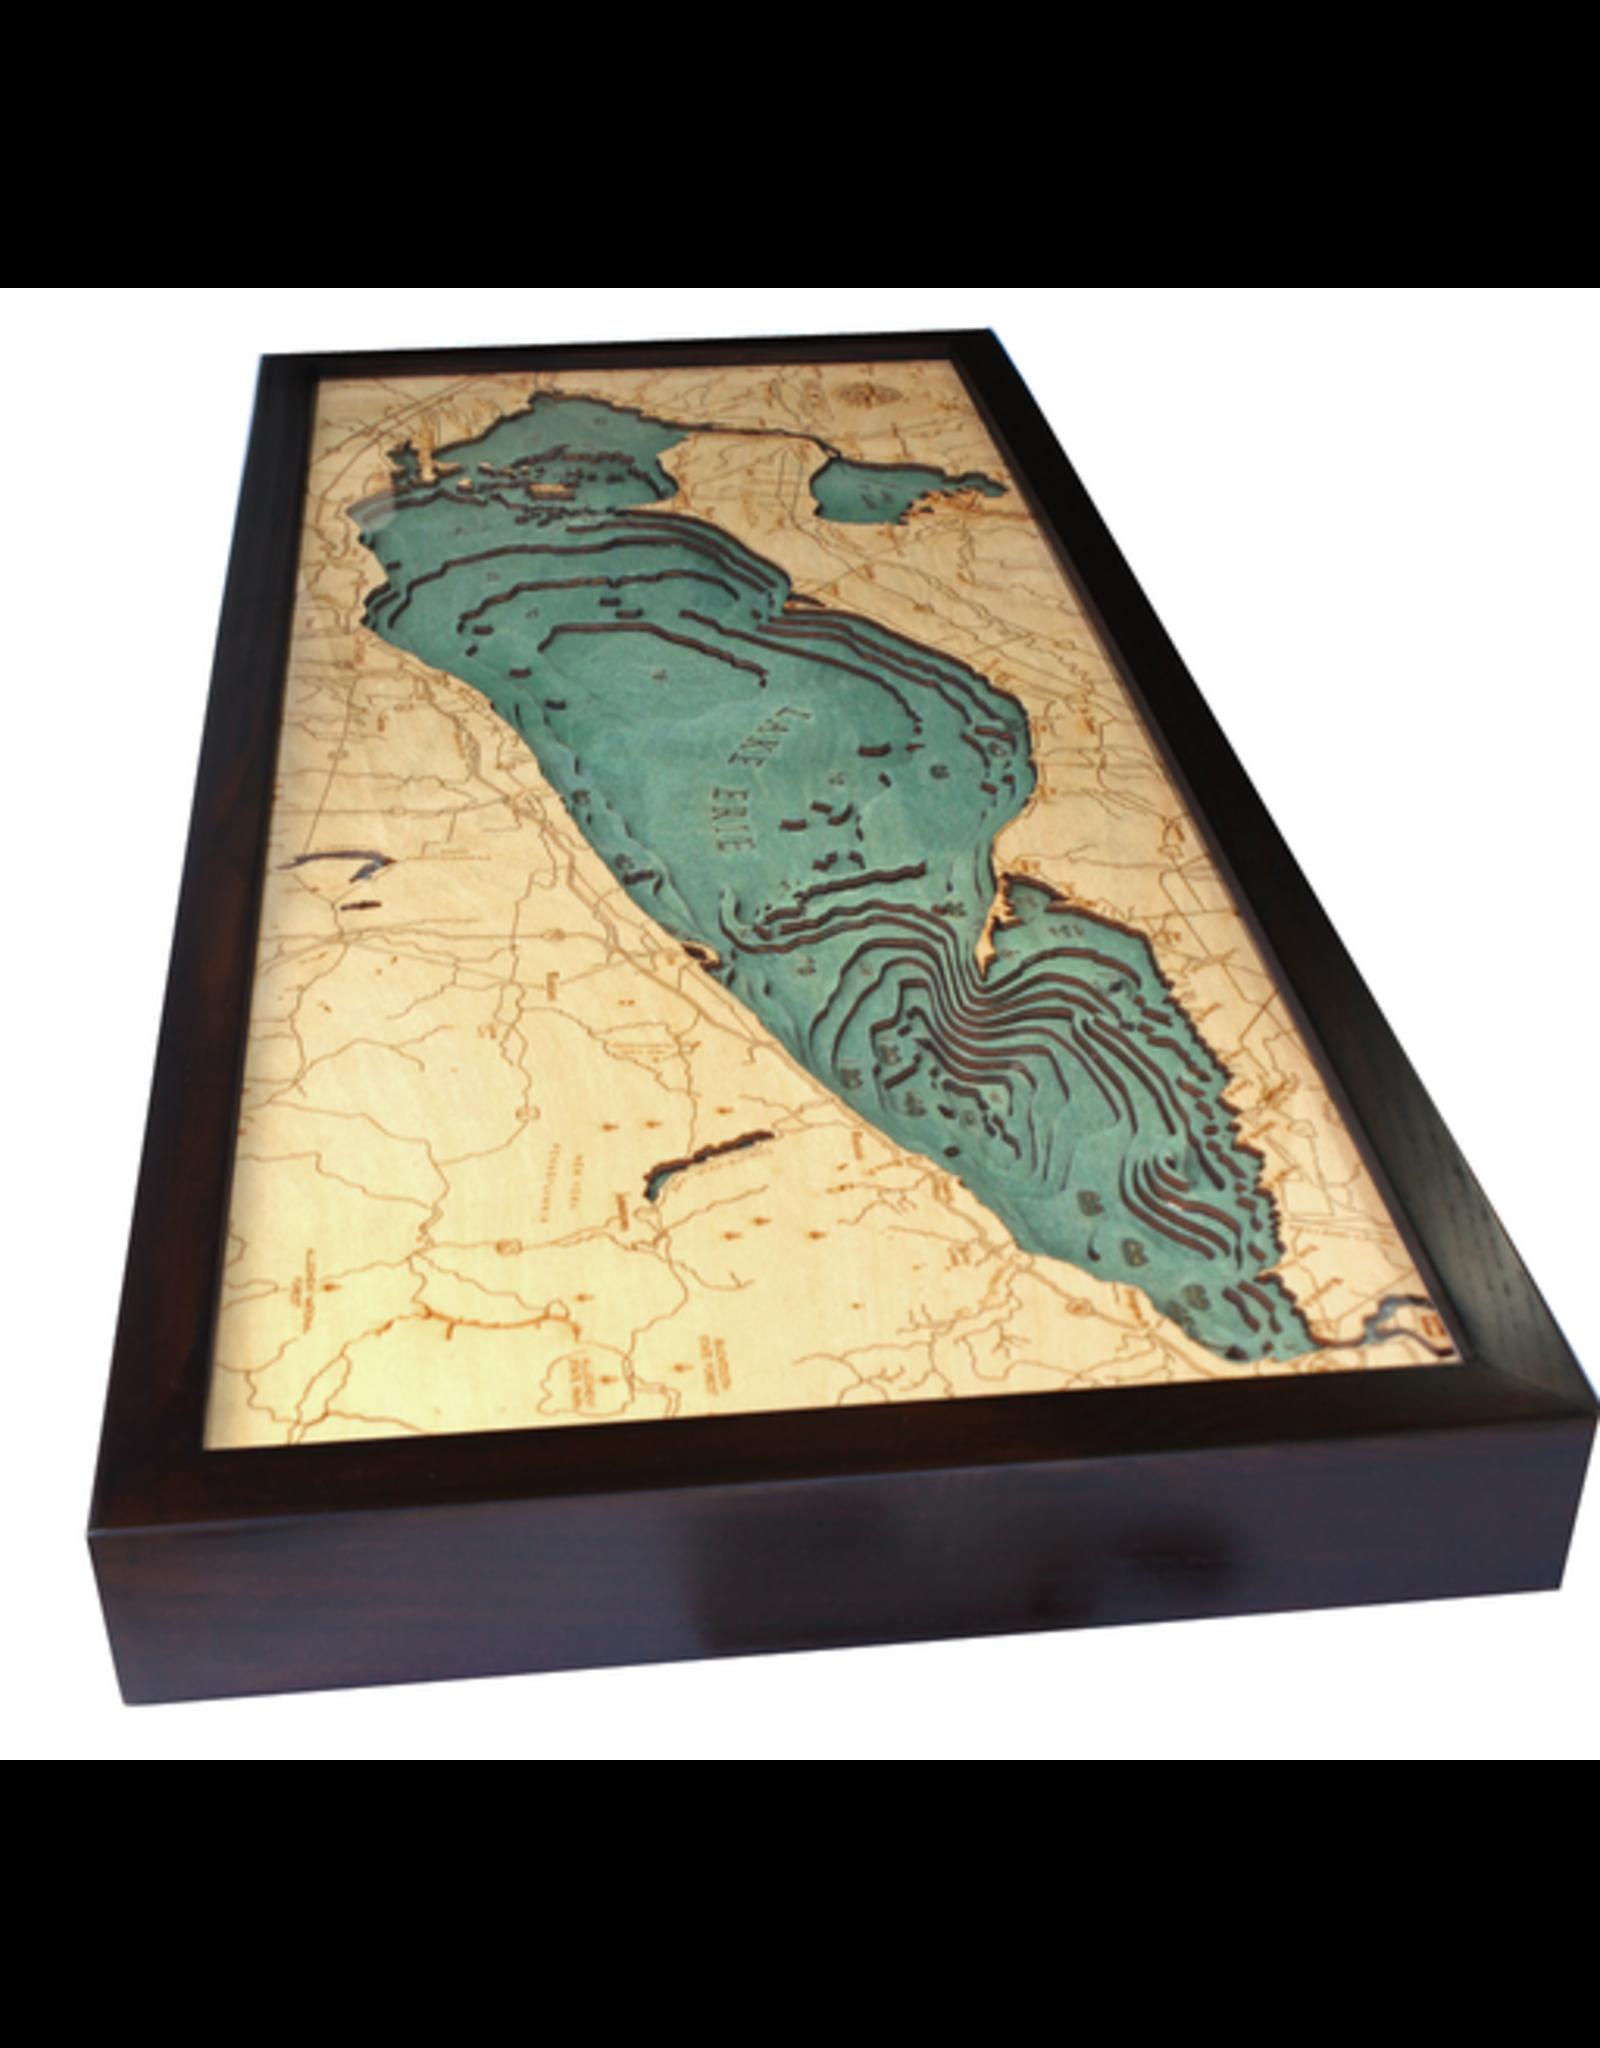 WoodCharts Lake Erie (Bathymetric 3-D Wood Carved Nautical Chart)